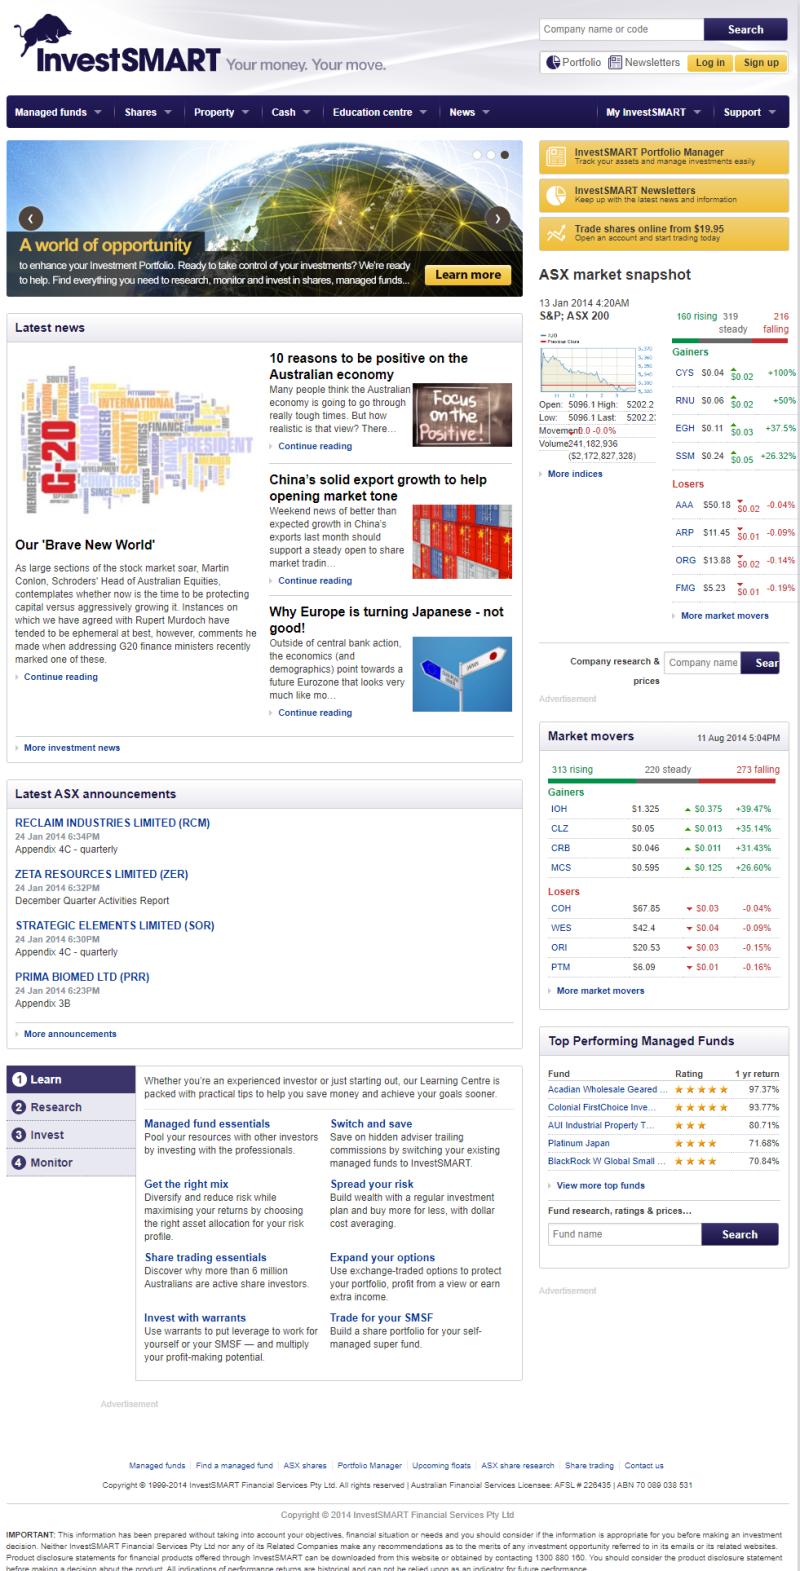 InvestSMART website in 2014